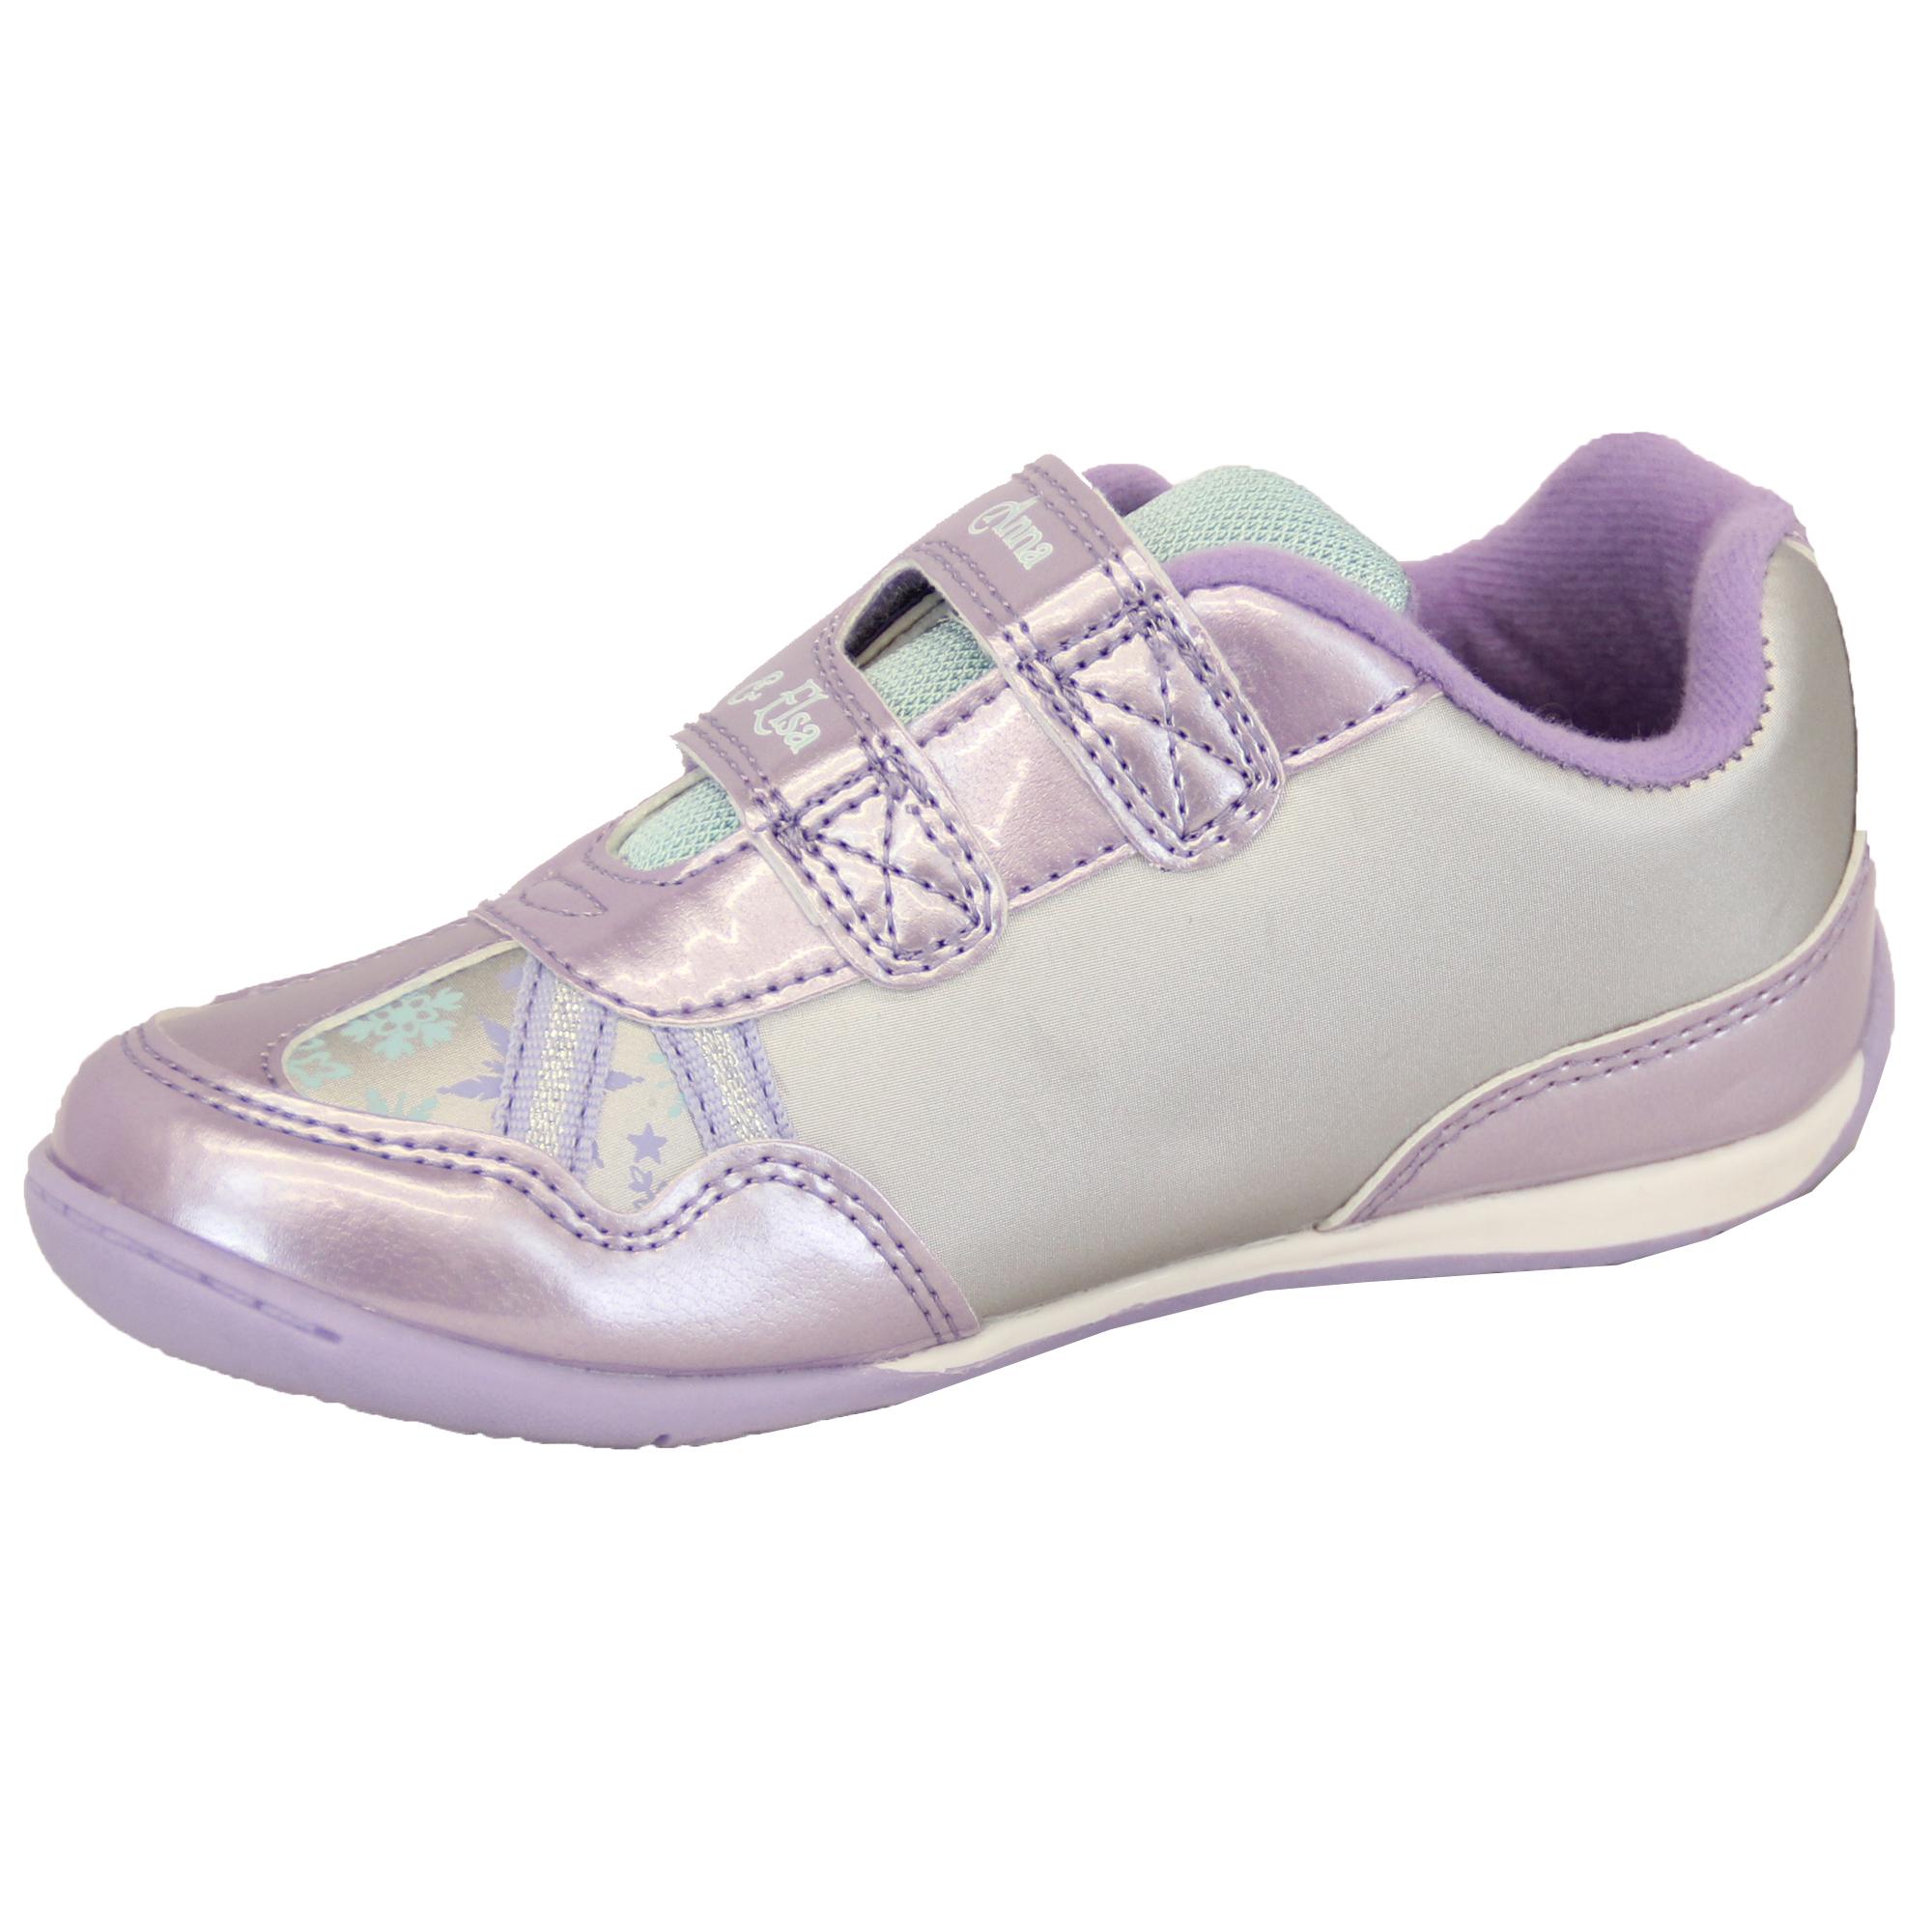 Girls Trainers Disney Frozen ANNA ELSA Lilac Shoes Glitter Velcro Crown Sports